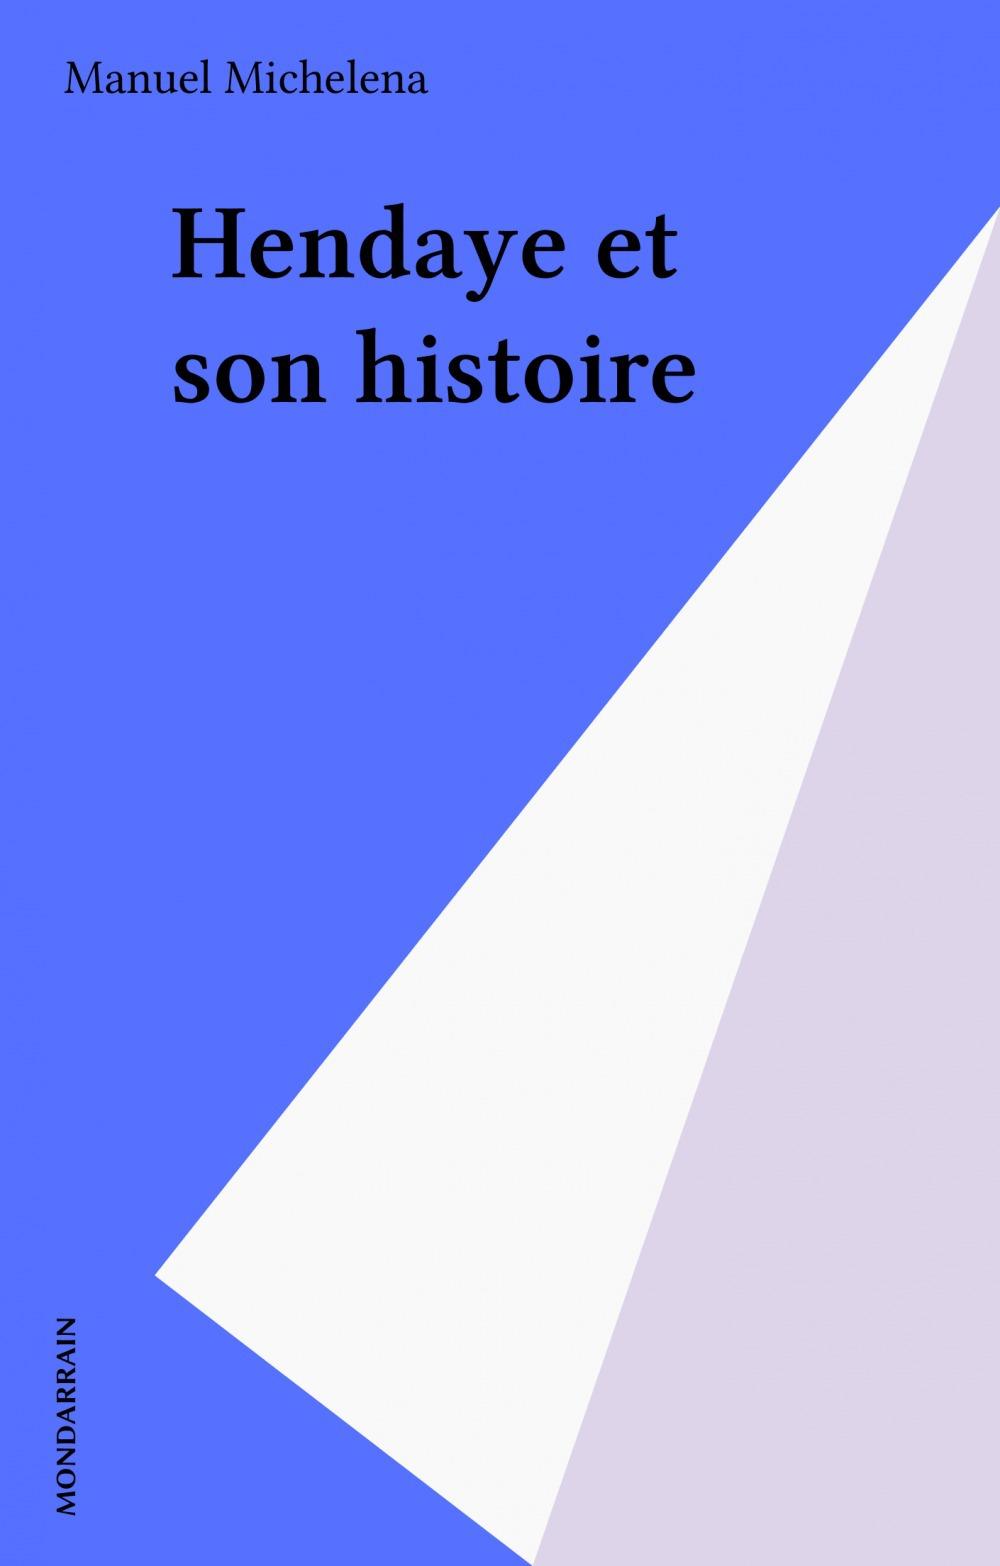 Hendaye et son histoire